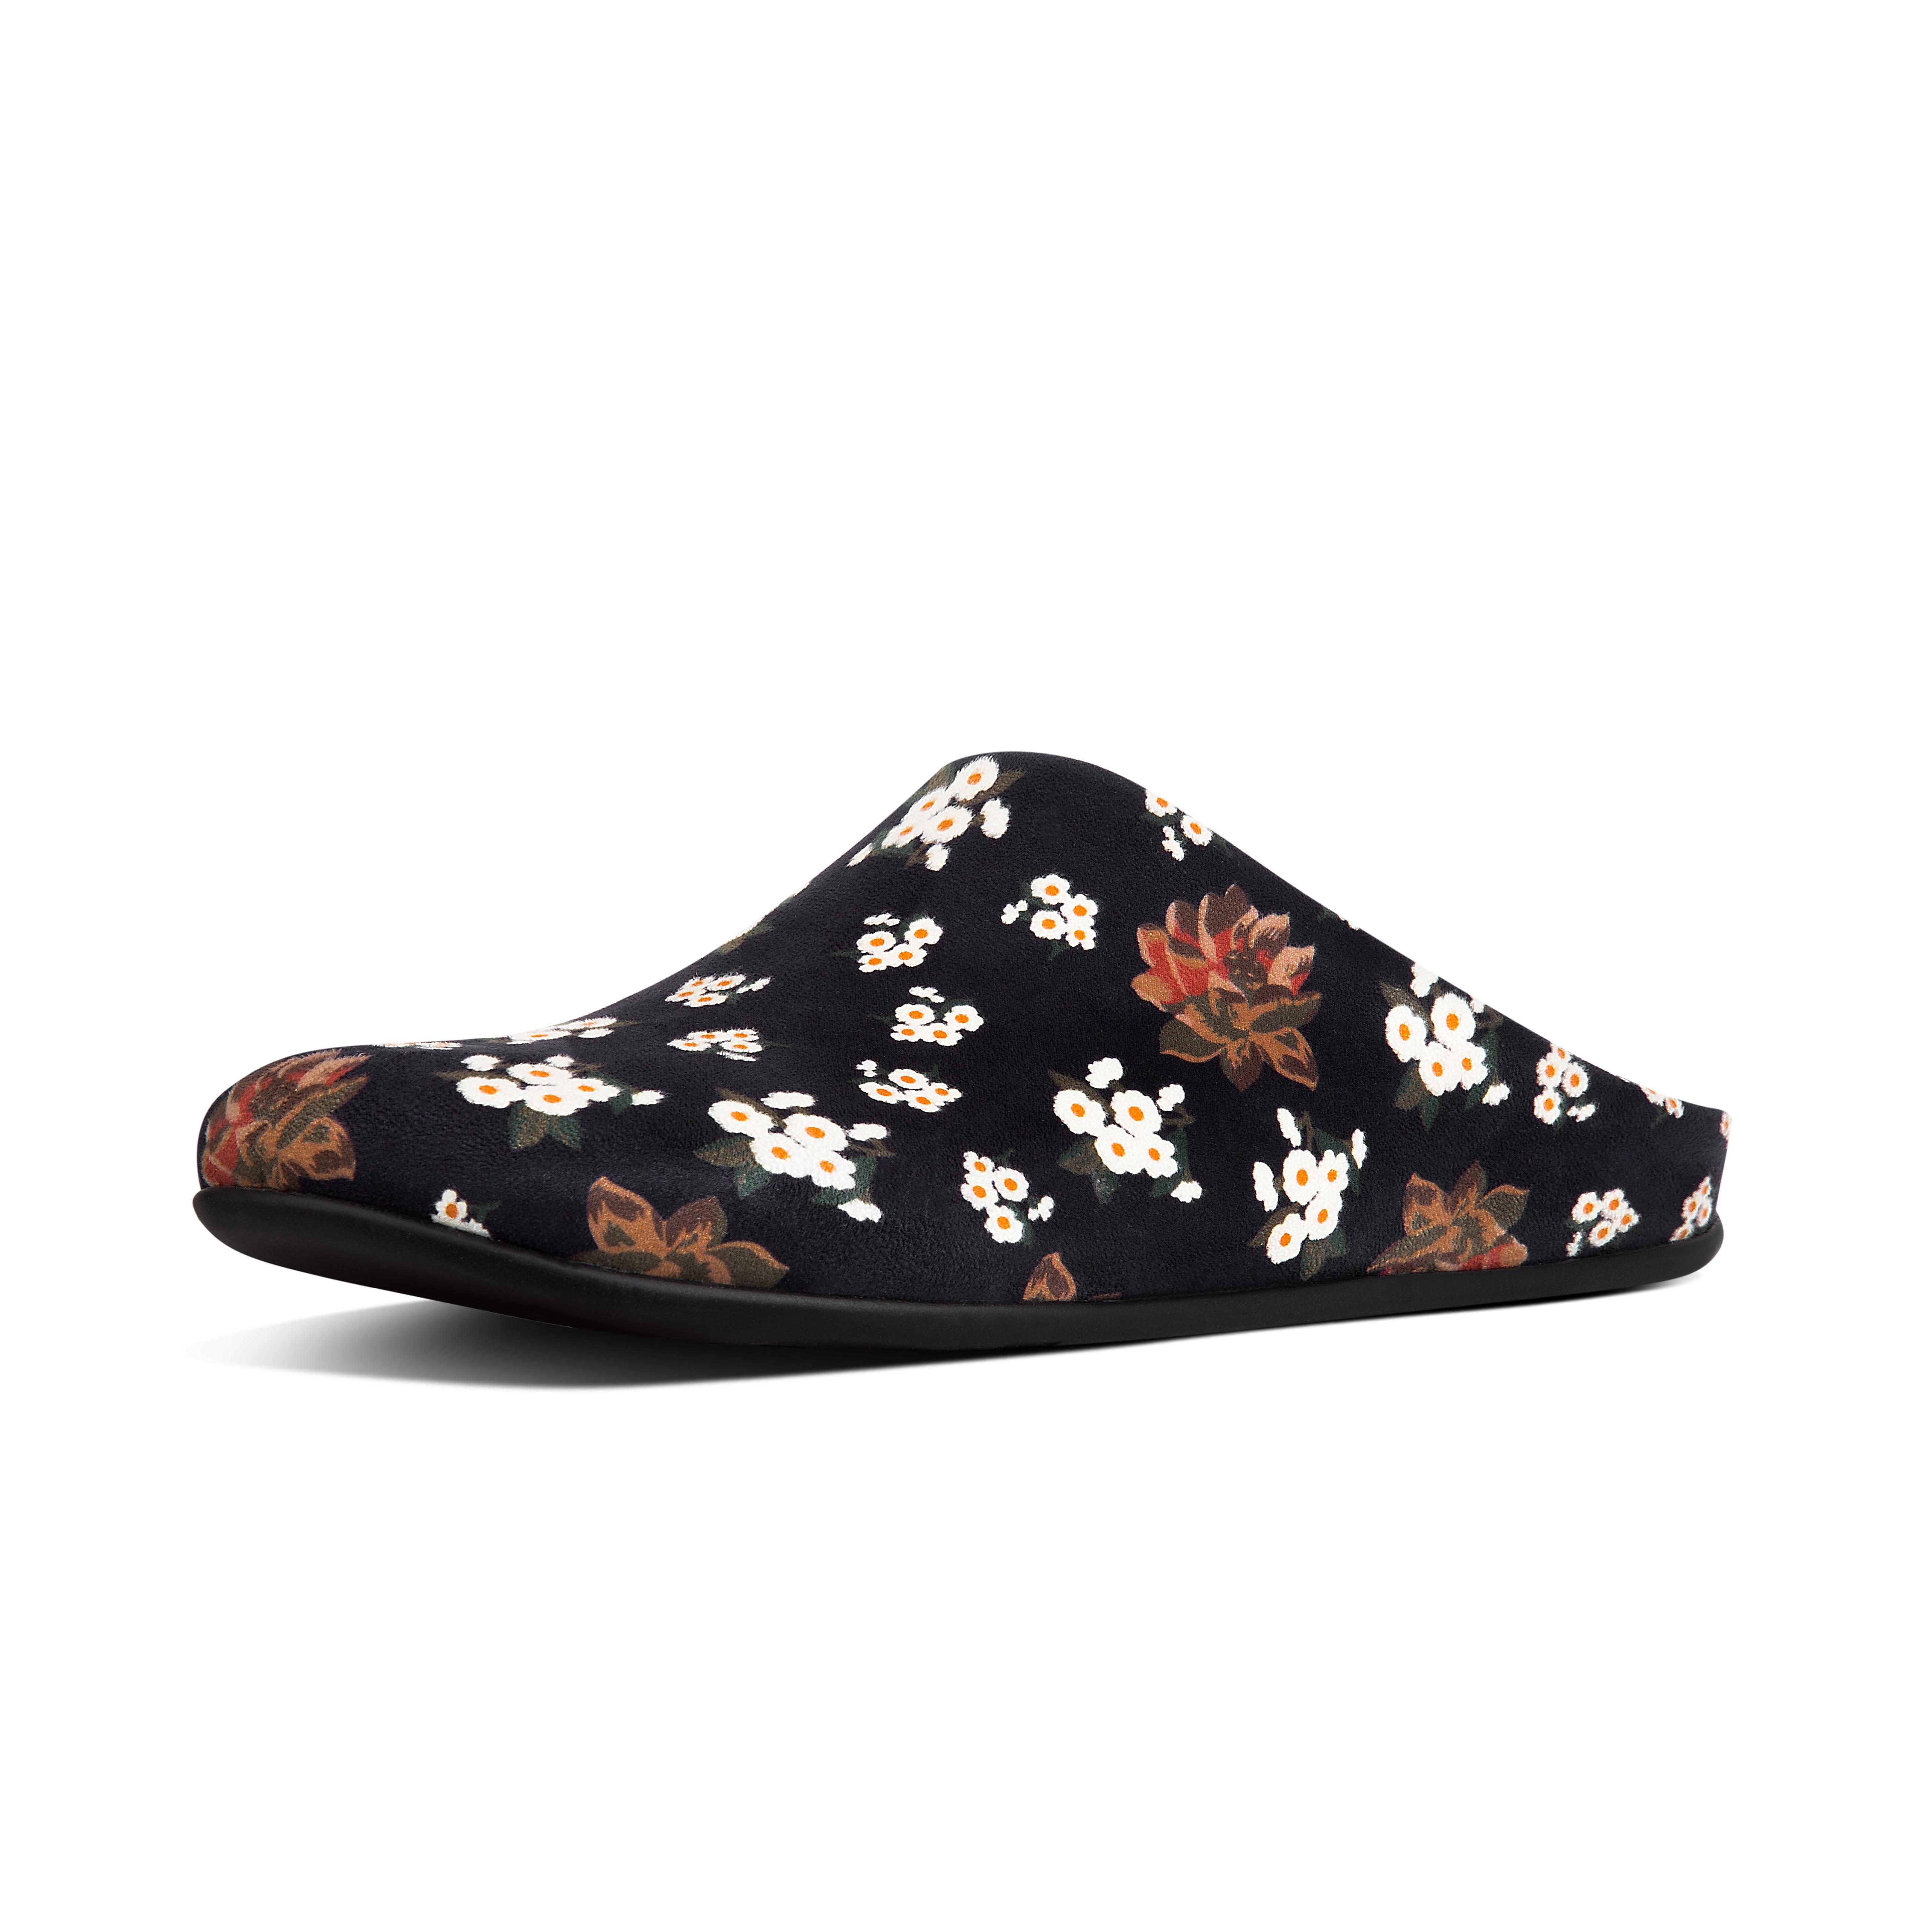 Chrissie dark floral slipper mule black n21 001?v=3